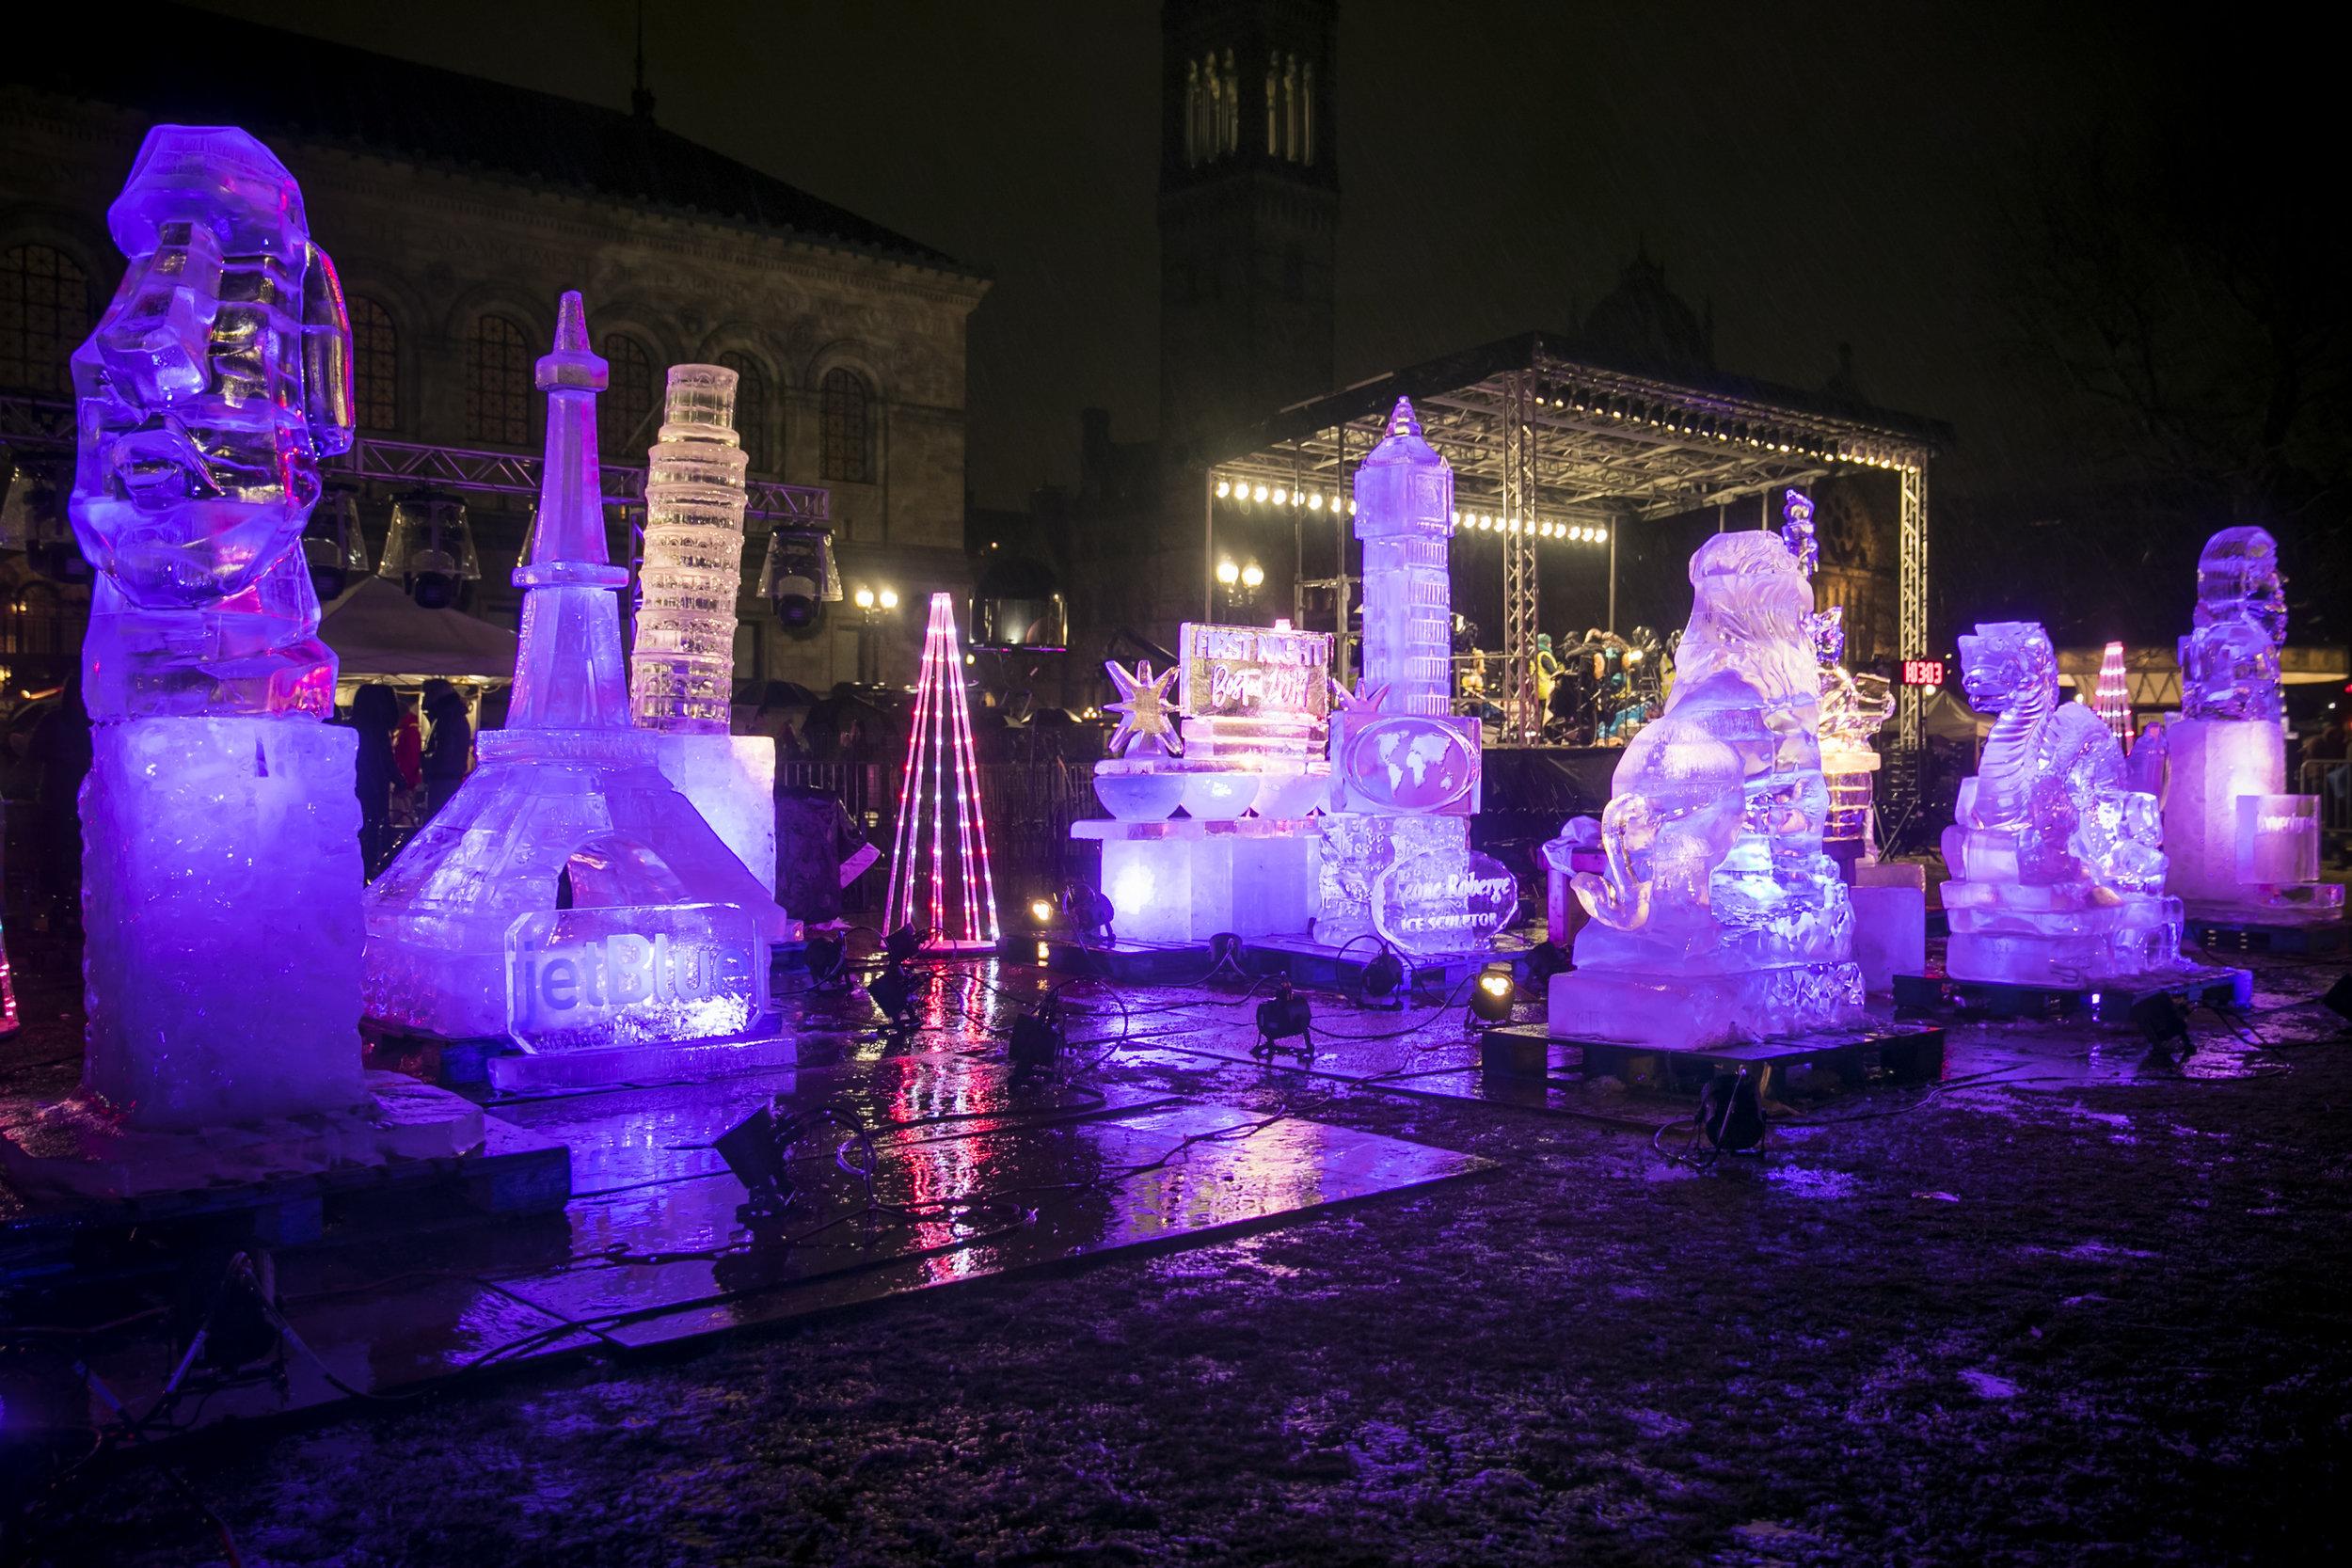 Ice Sculpture Lighting Port Lighting First Night Boston 2019.jpg